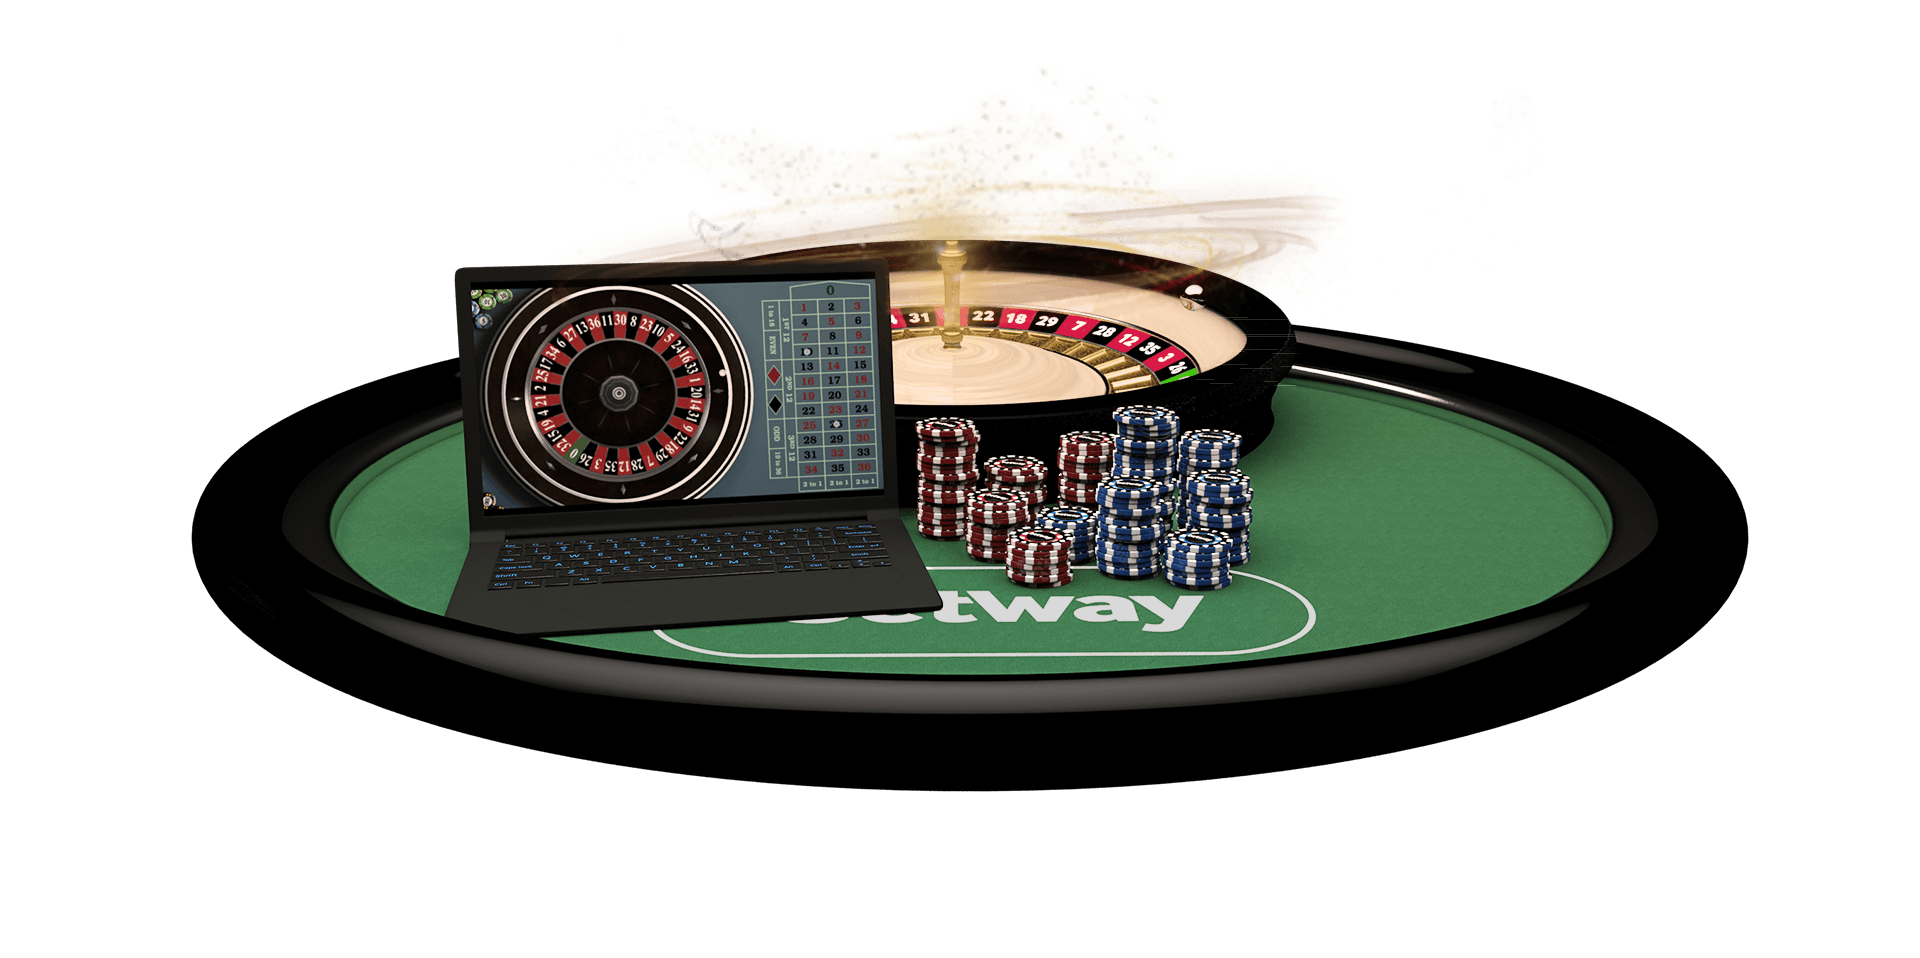 bonus roulette spielen bet way casino online